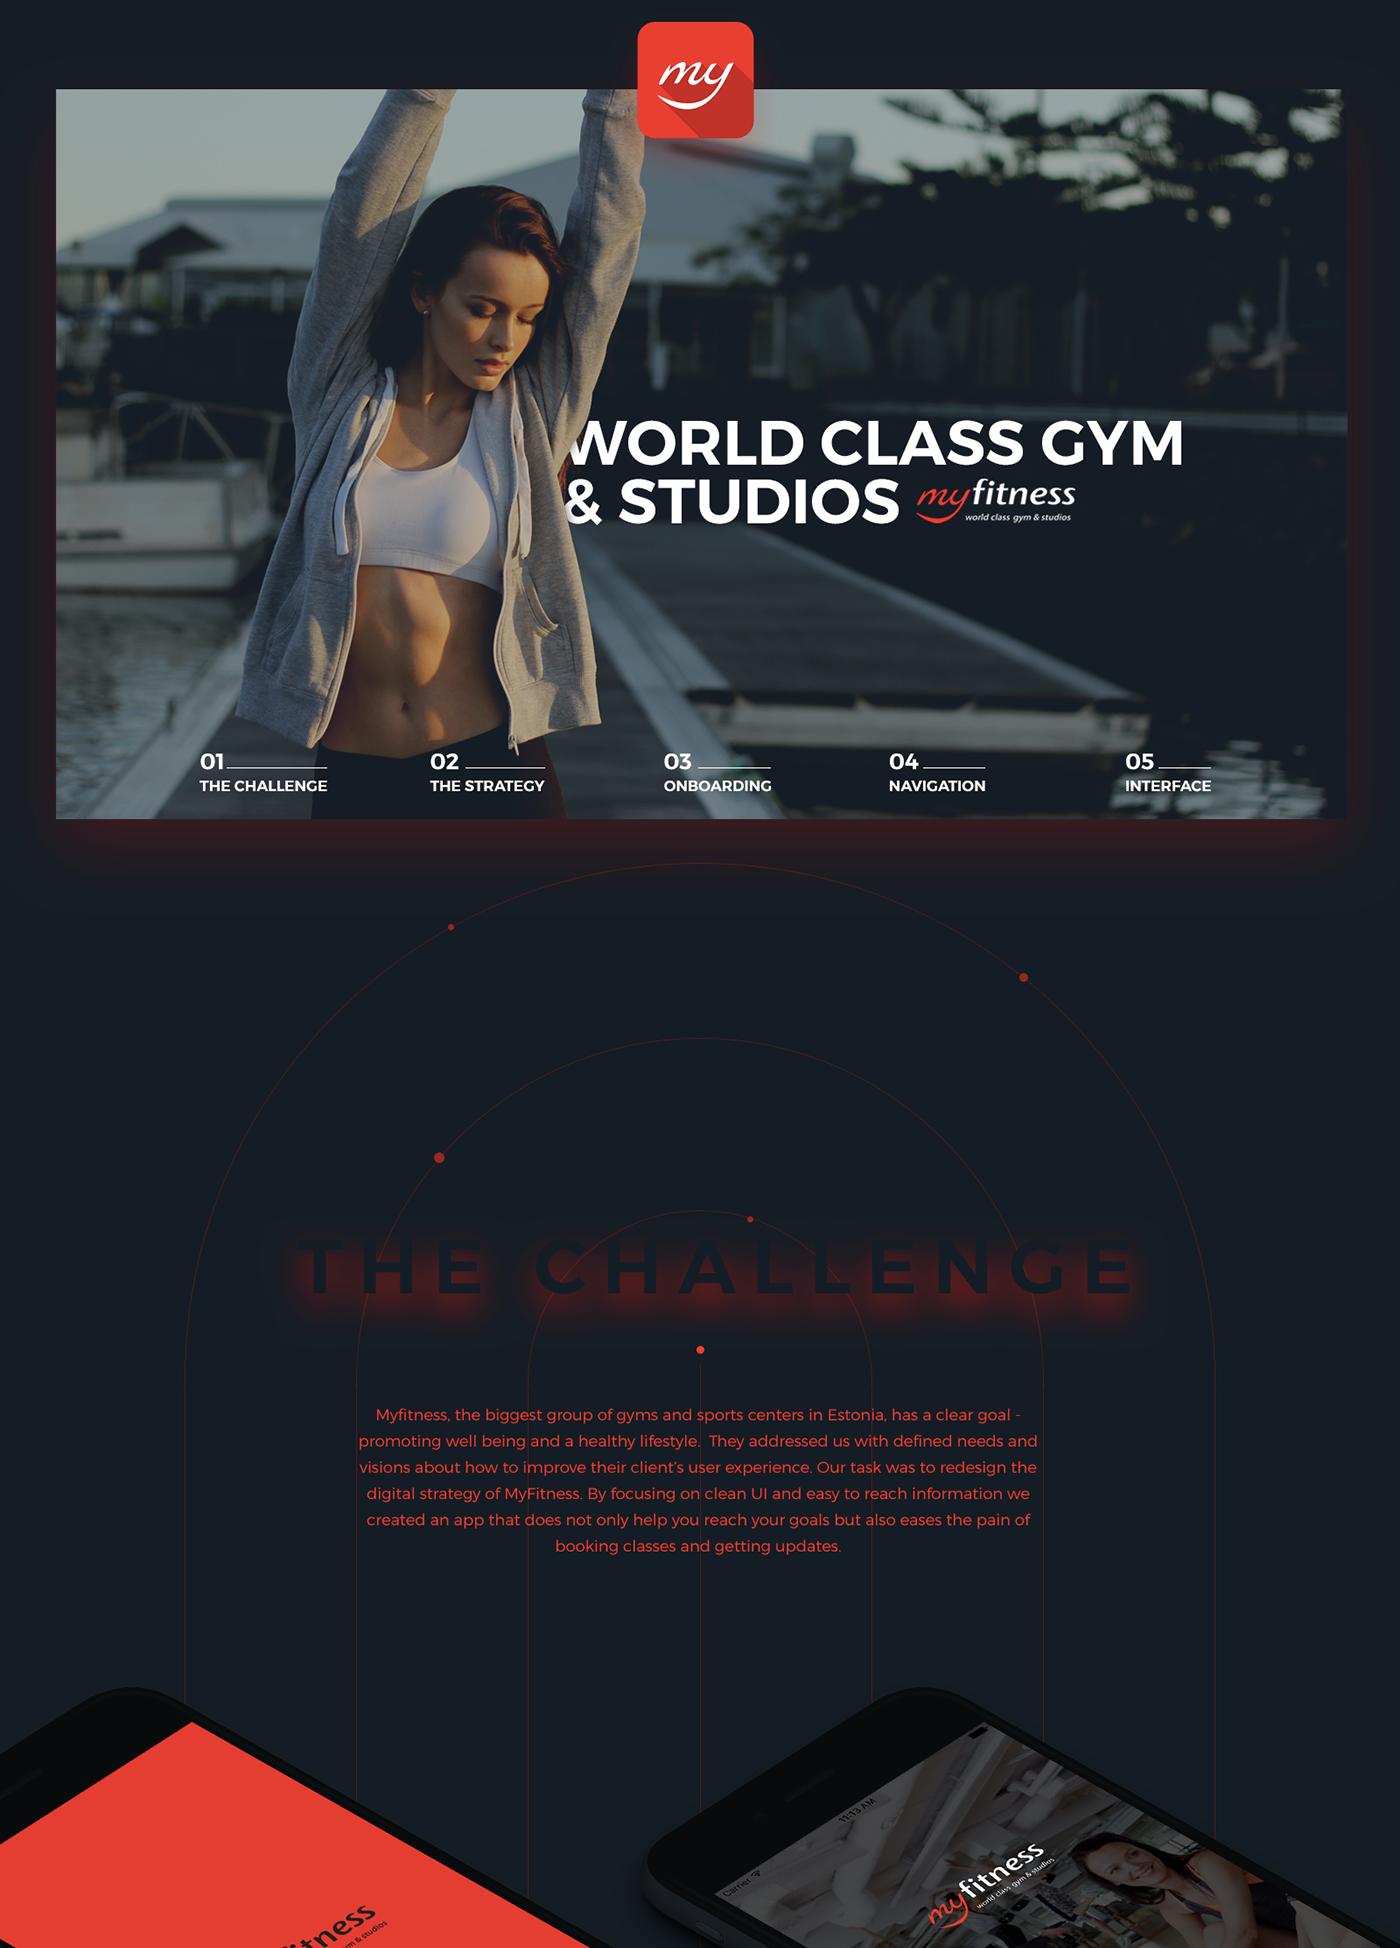 fitness heath sports studio gym mobile ux/ui user experience Estonia sport